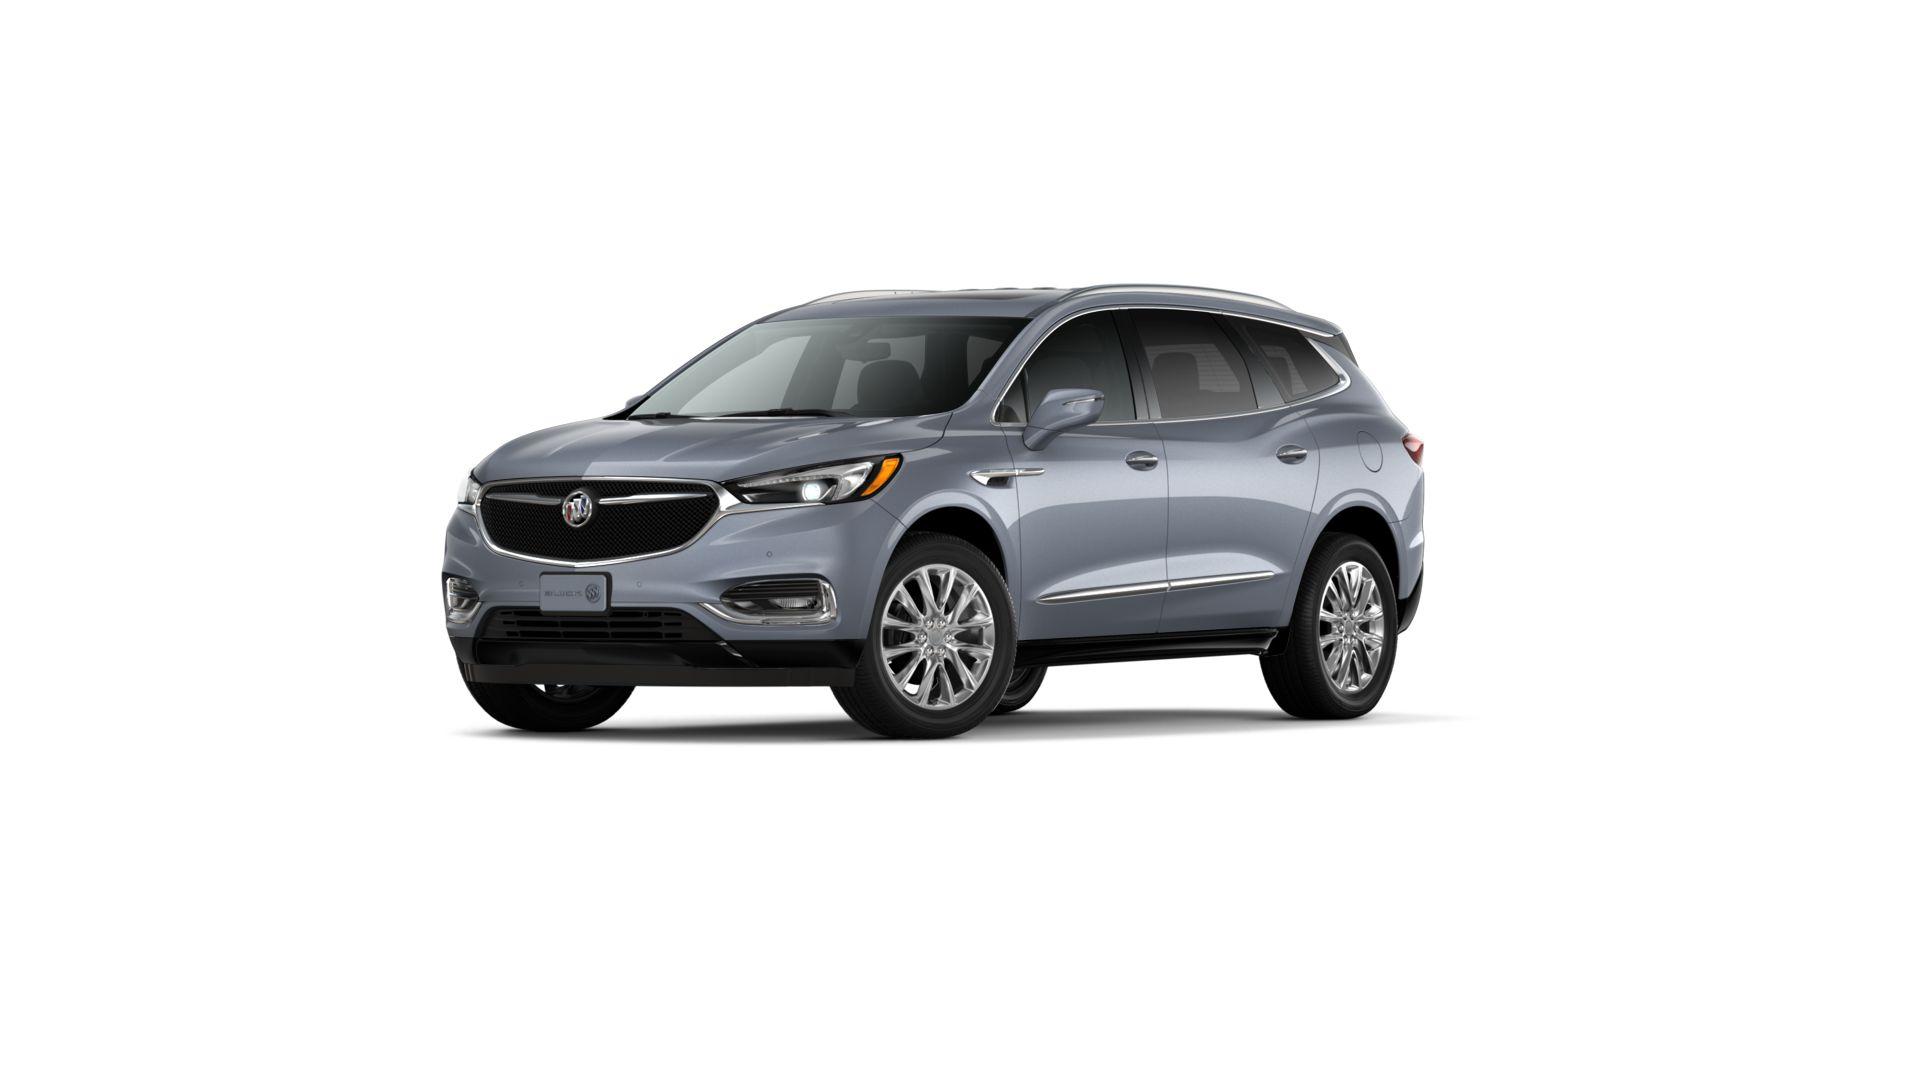 New 2020 Buick Enclave Premium Crossover For Sale in Vidalia, GA